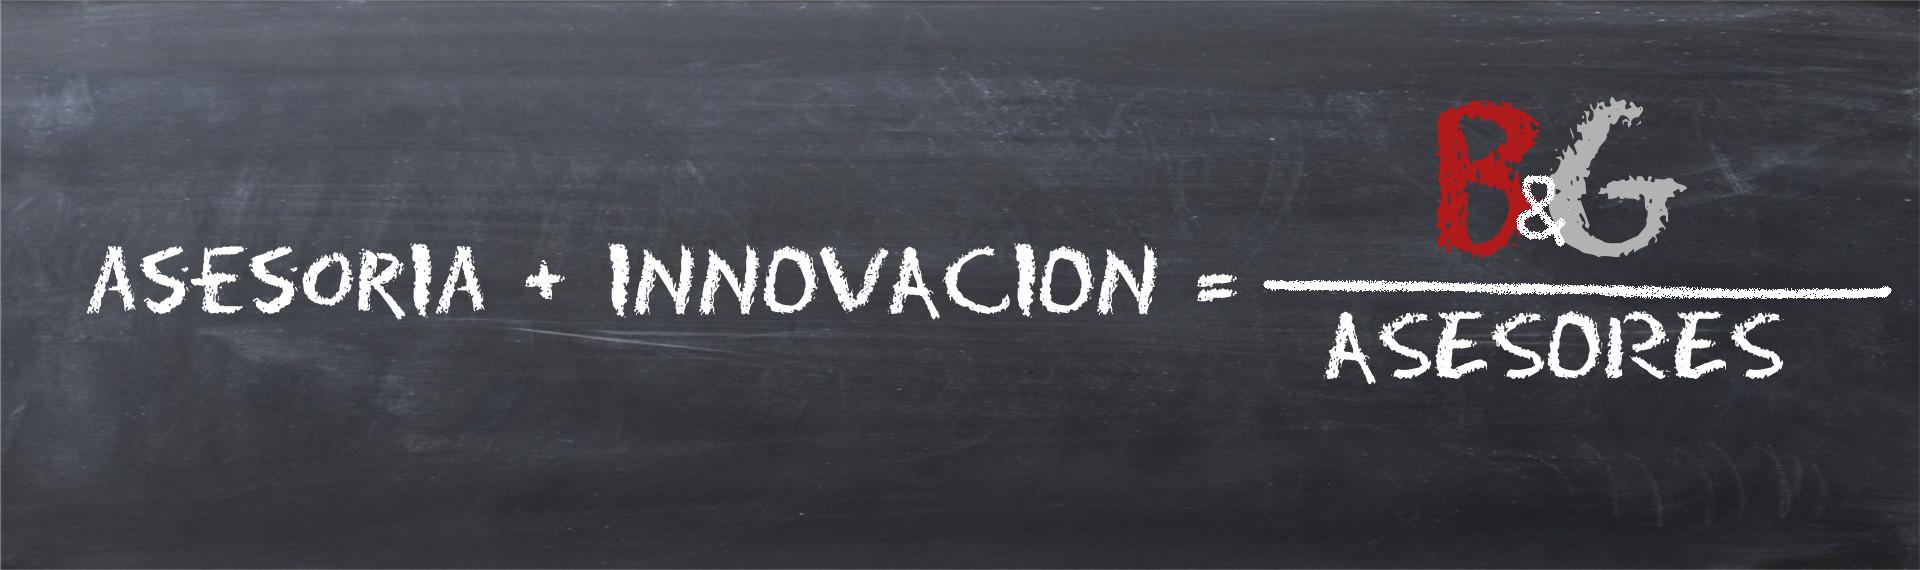 asesoria-mas-innovacion